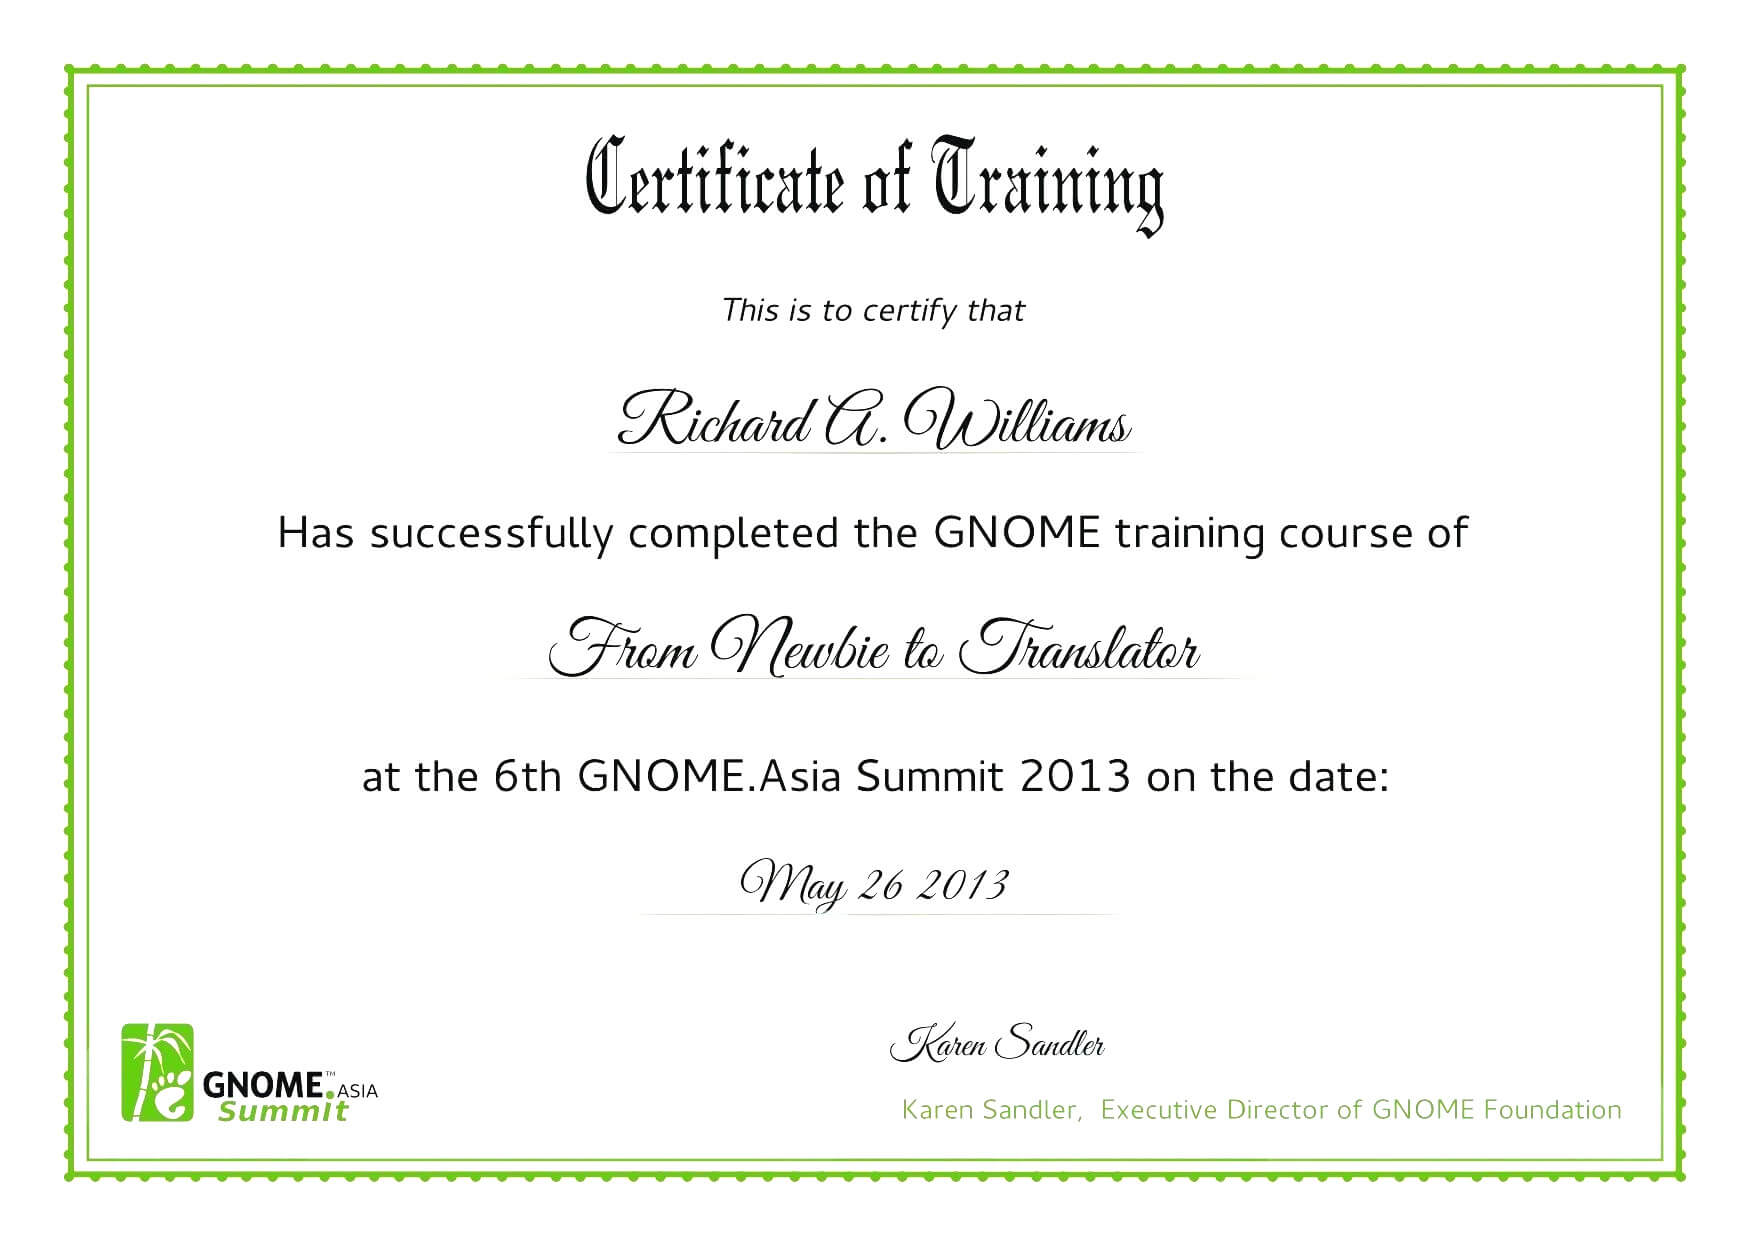 Award Certificate Templates Word 2007 - Atlantaauctionco Within Award Certificate Templates Word 2007